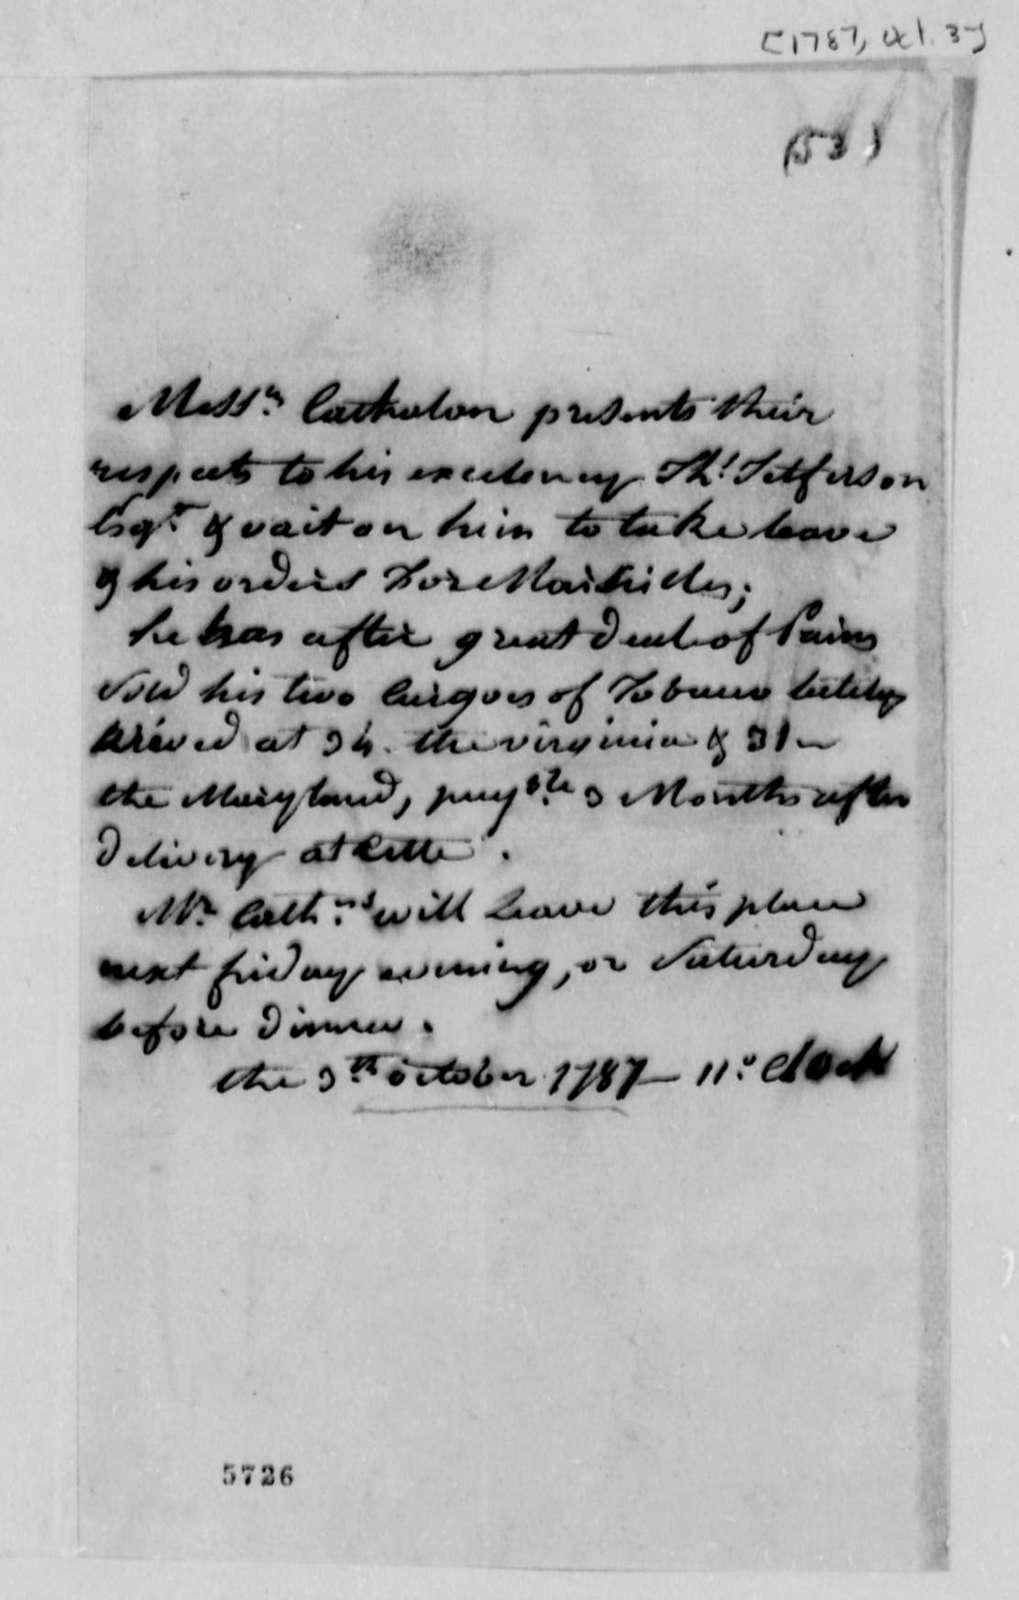 Stephen Cathalan Jr. to Thomas Jefferson, October 3, 1787